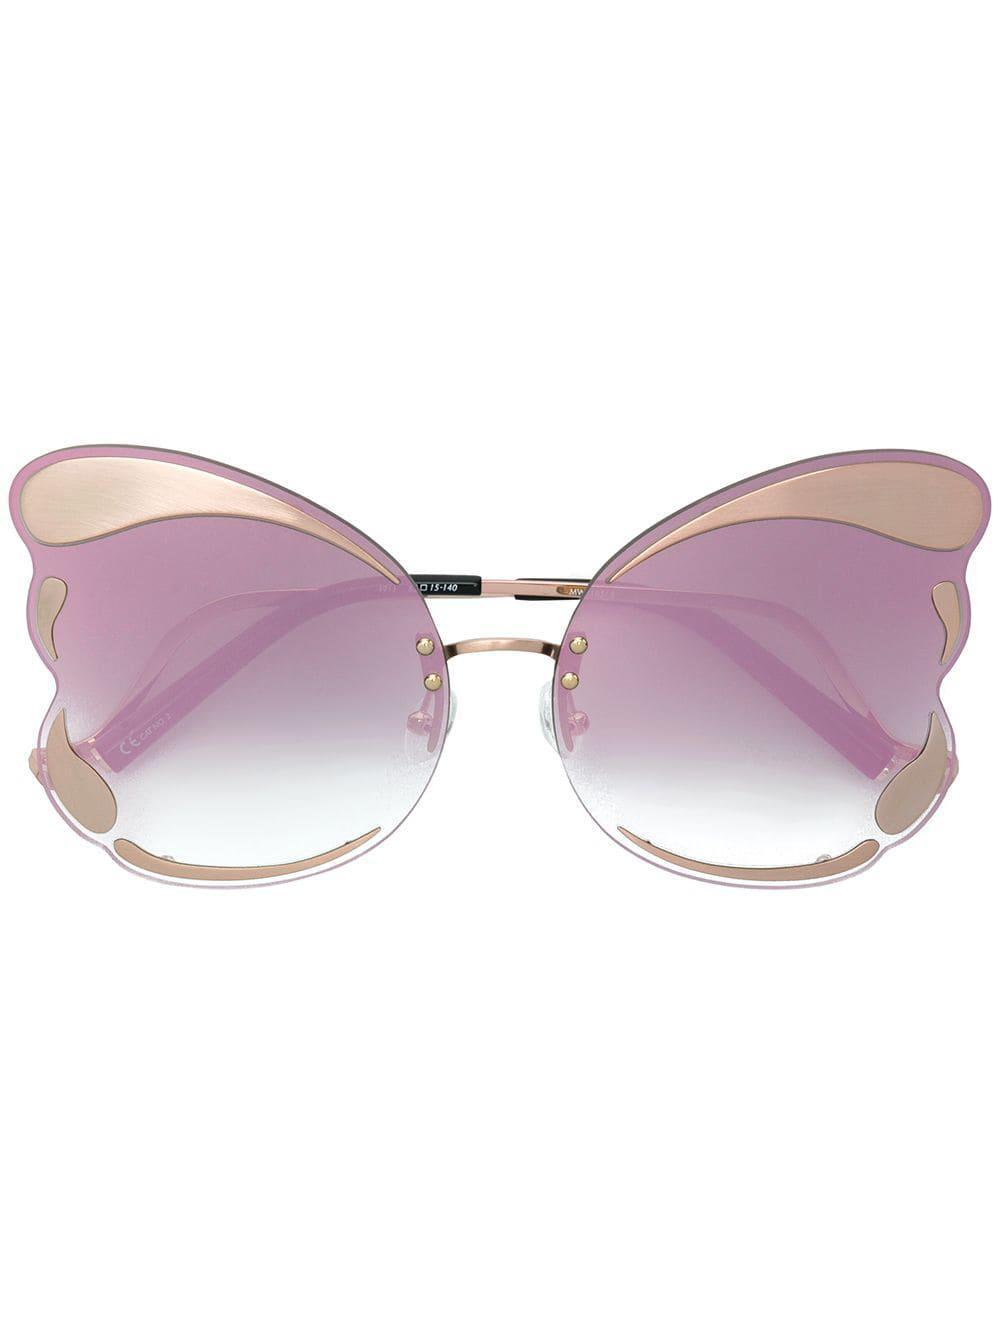 Linda Farrow Matthew Williamson X Linda Farrow Butterfly Sunglasses